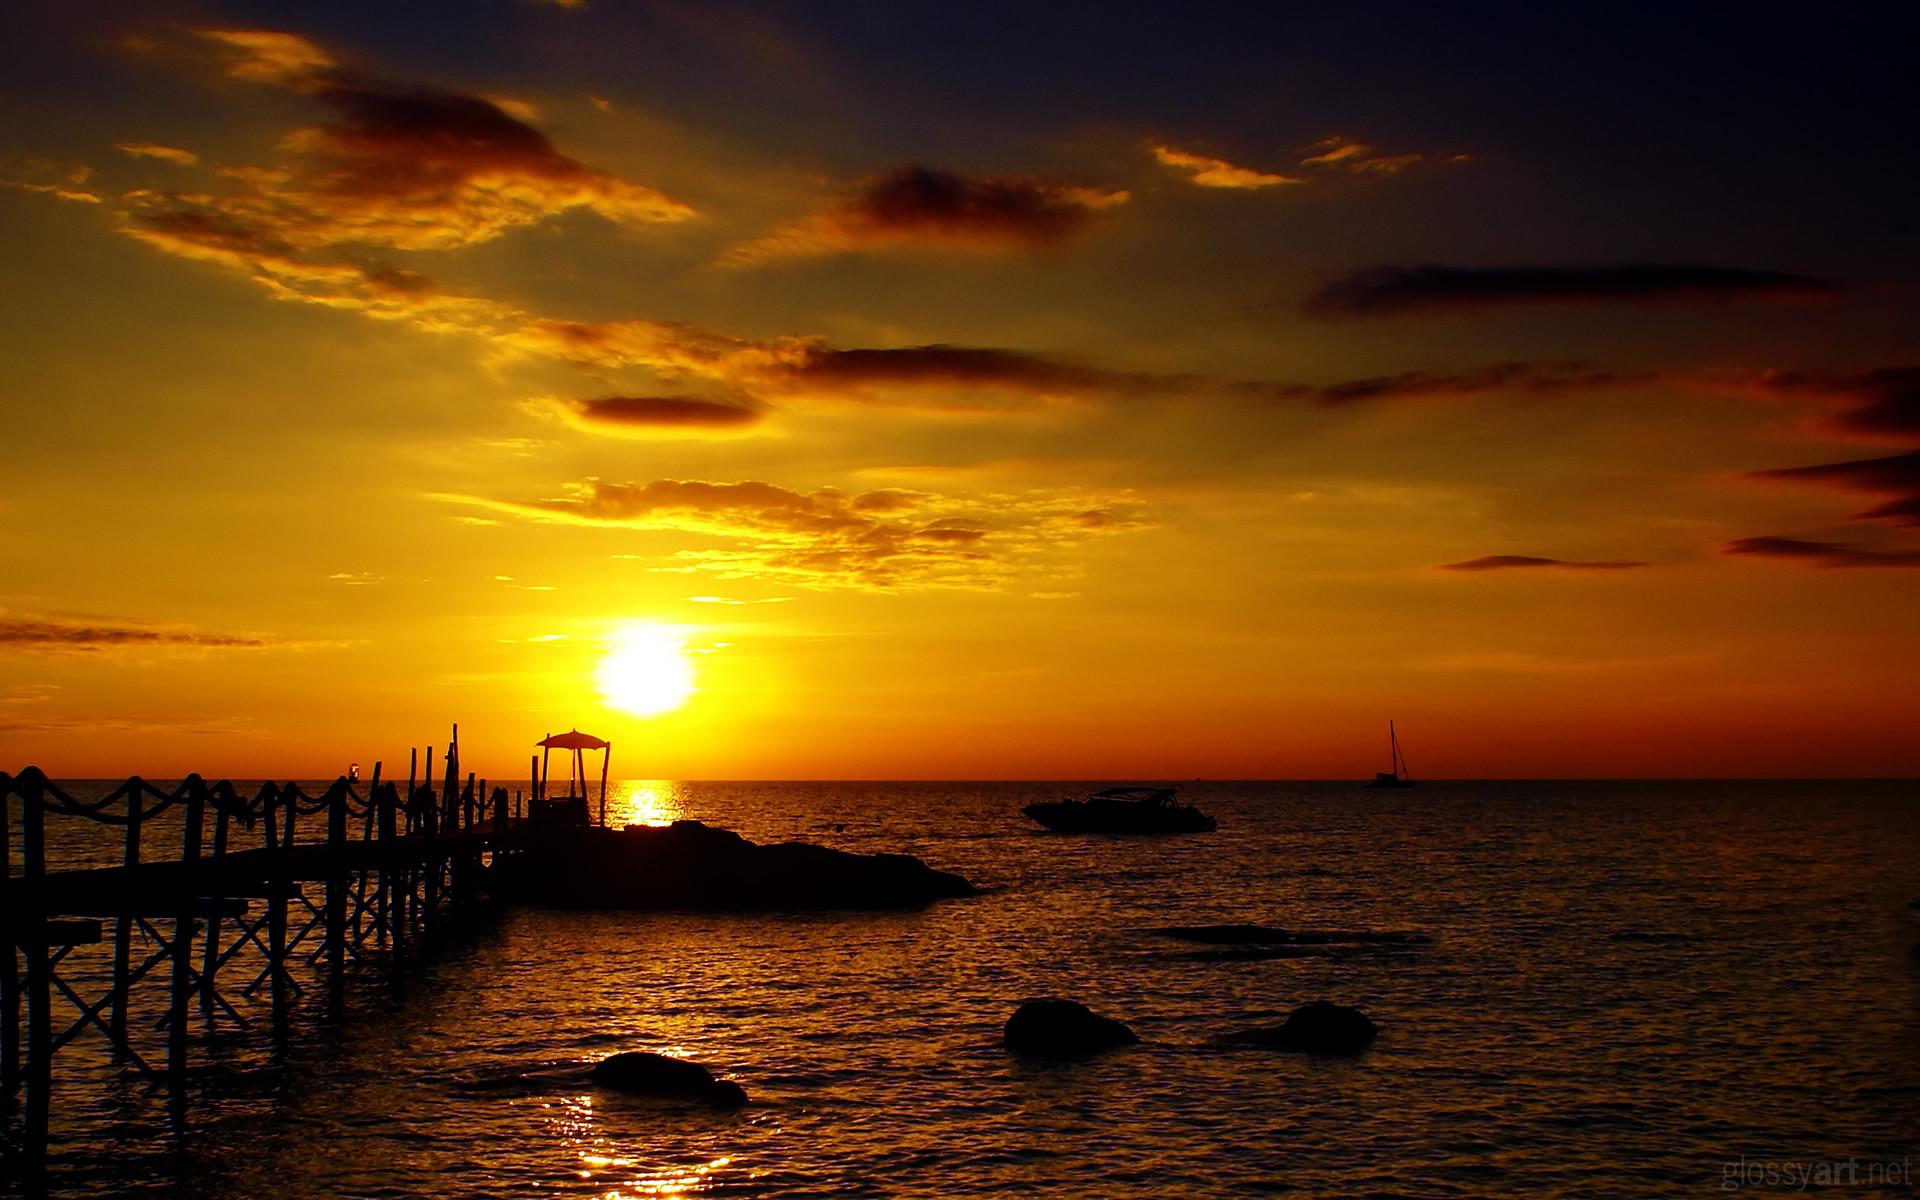 sunset wallpaper hd (82+ images)